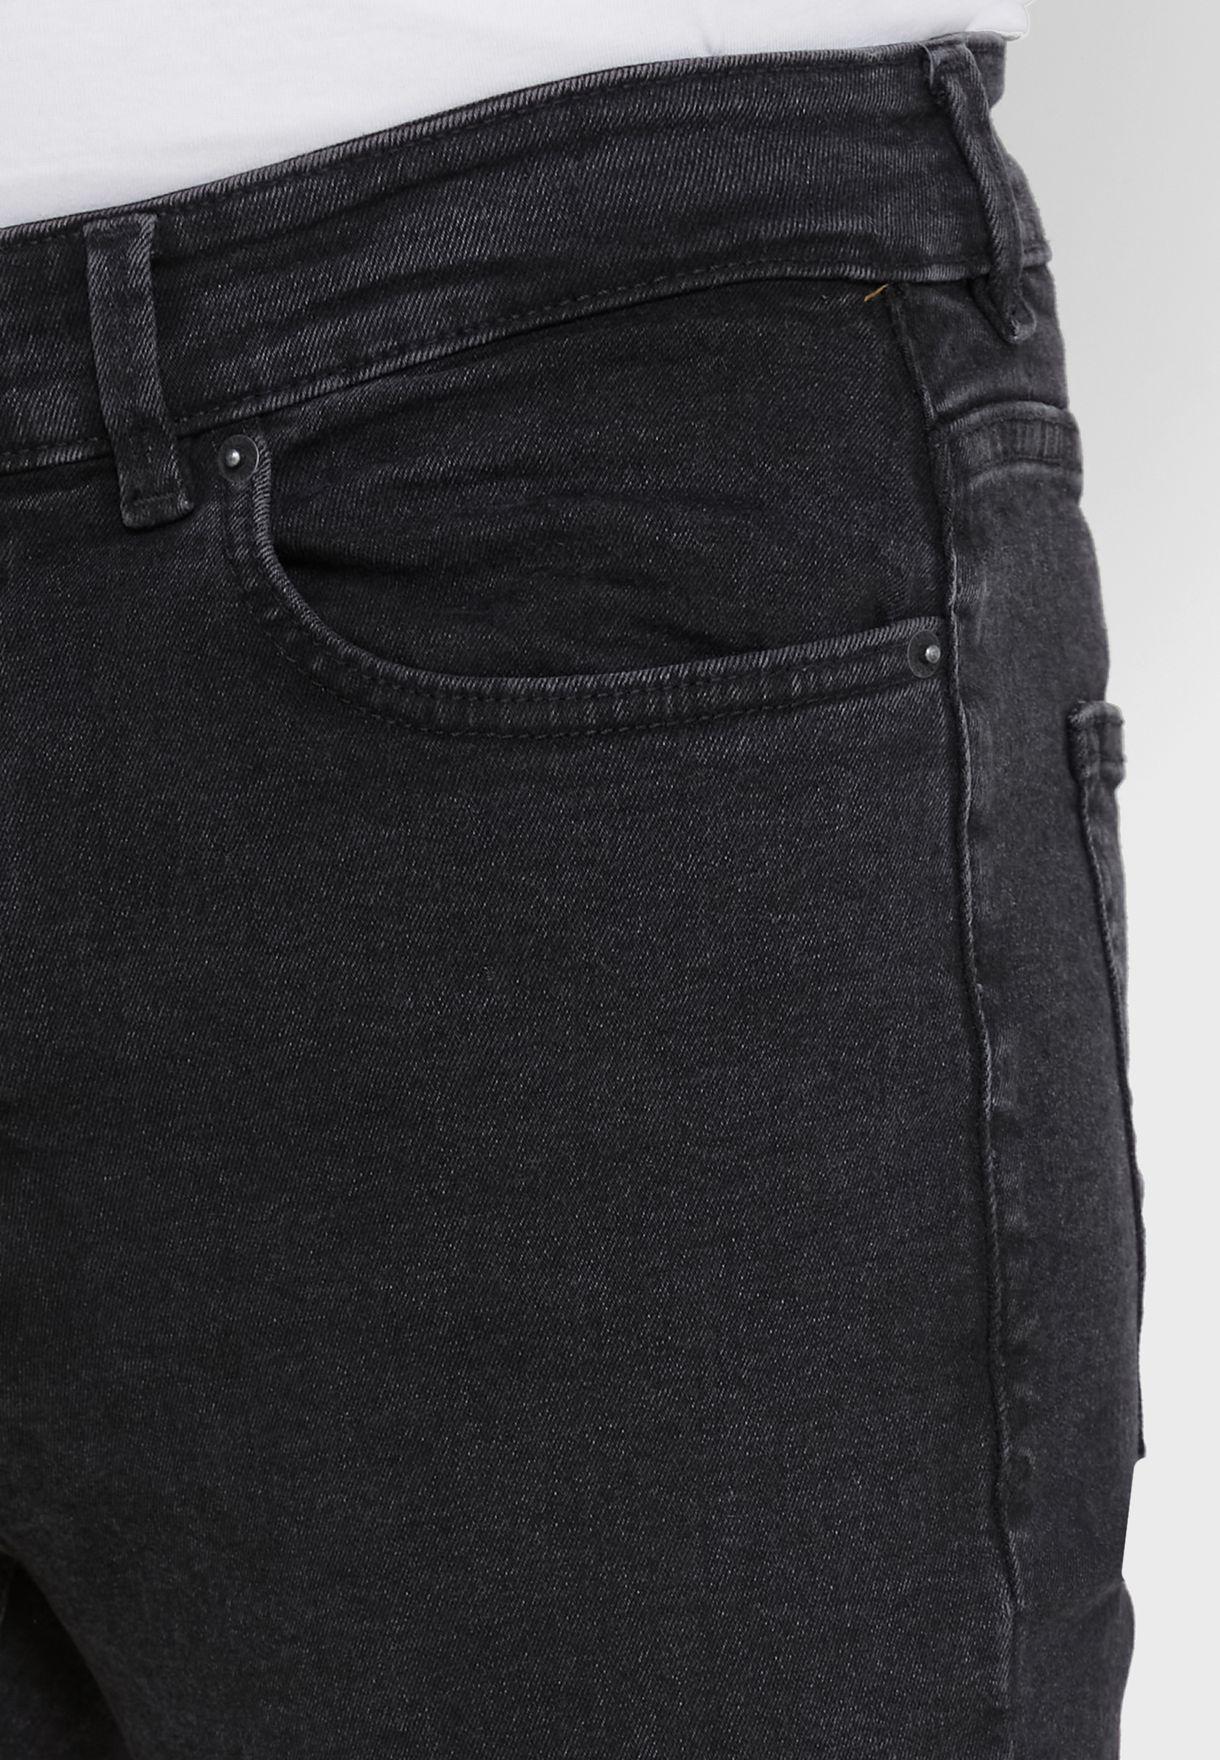 Scar Super Skinny Fit Jeans